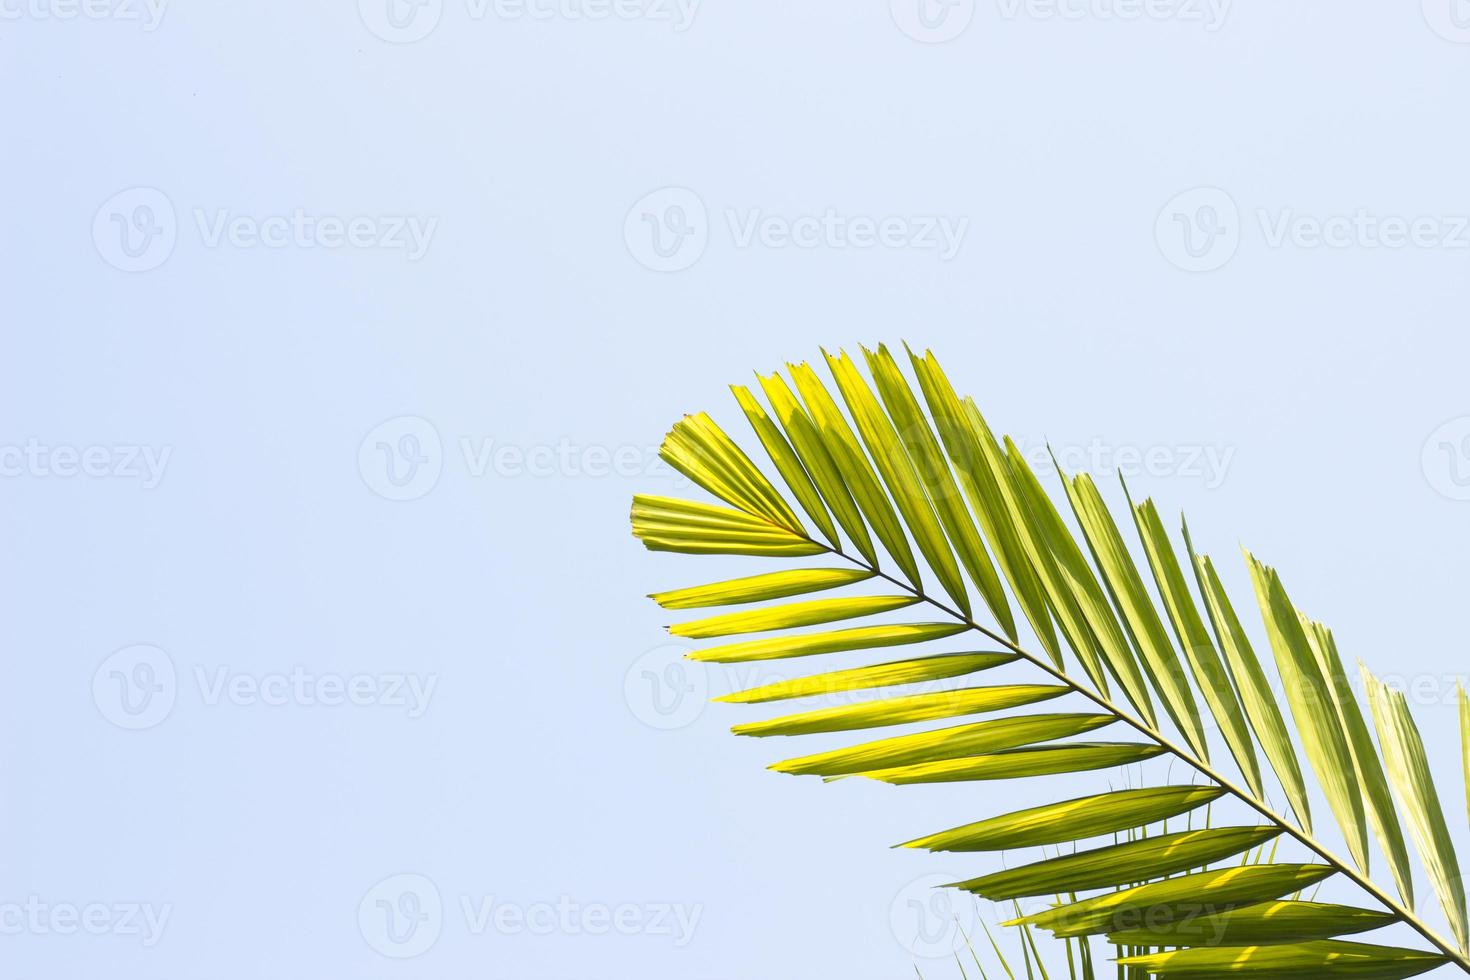 tropisk växt fernleaf häck bambu grenar på vit bak foto